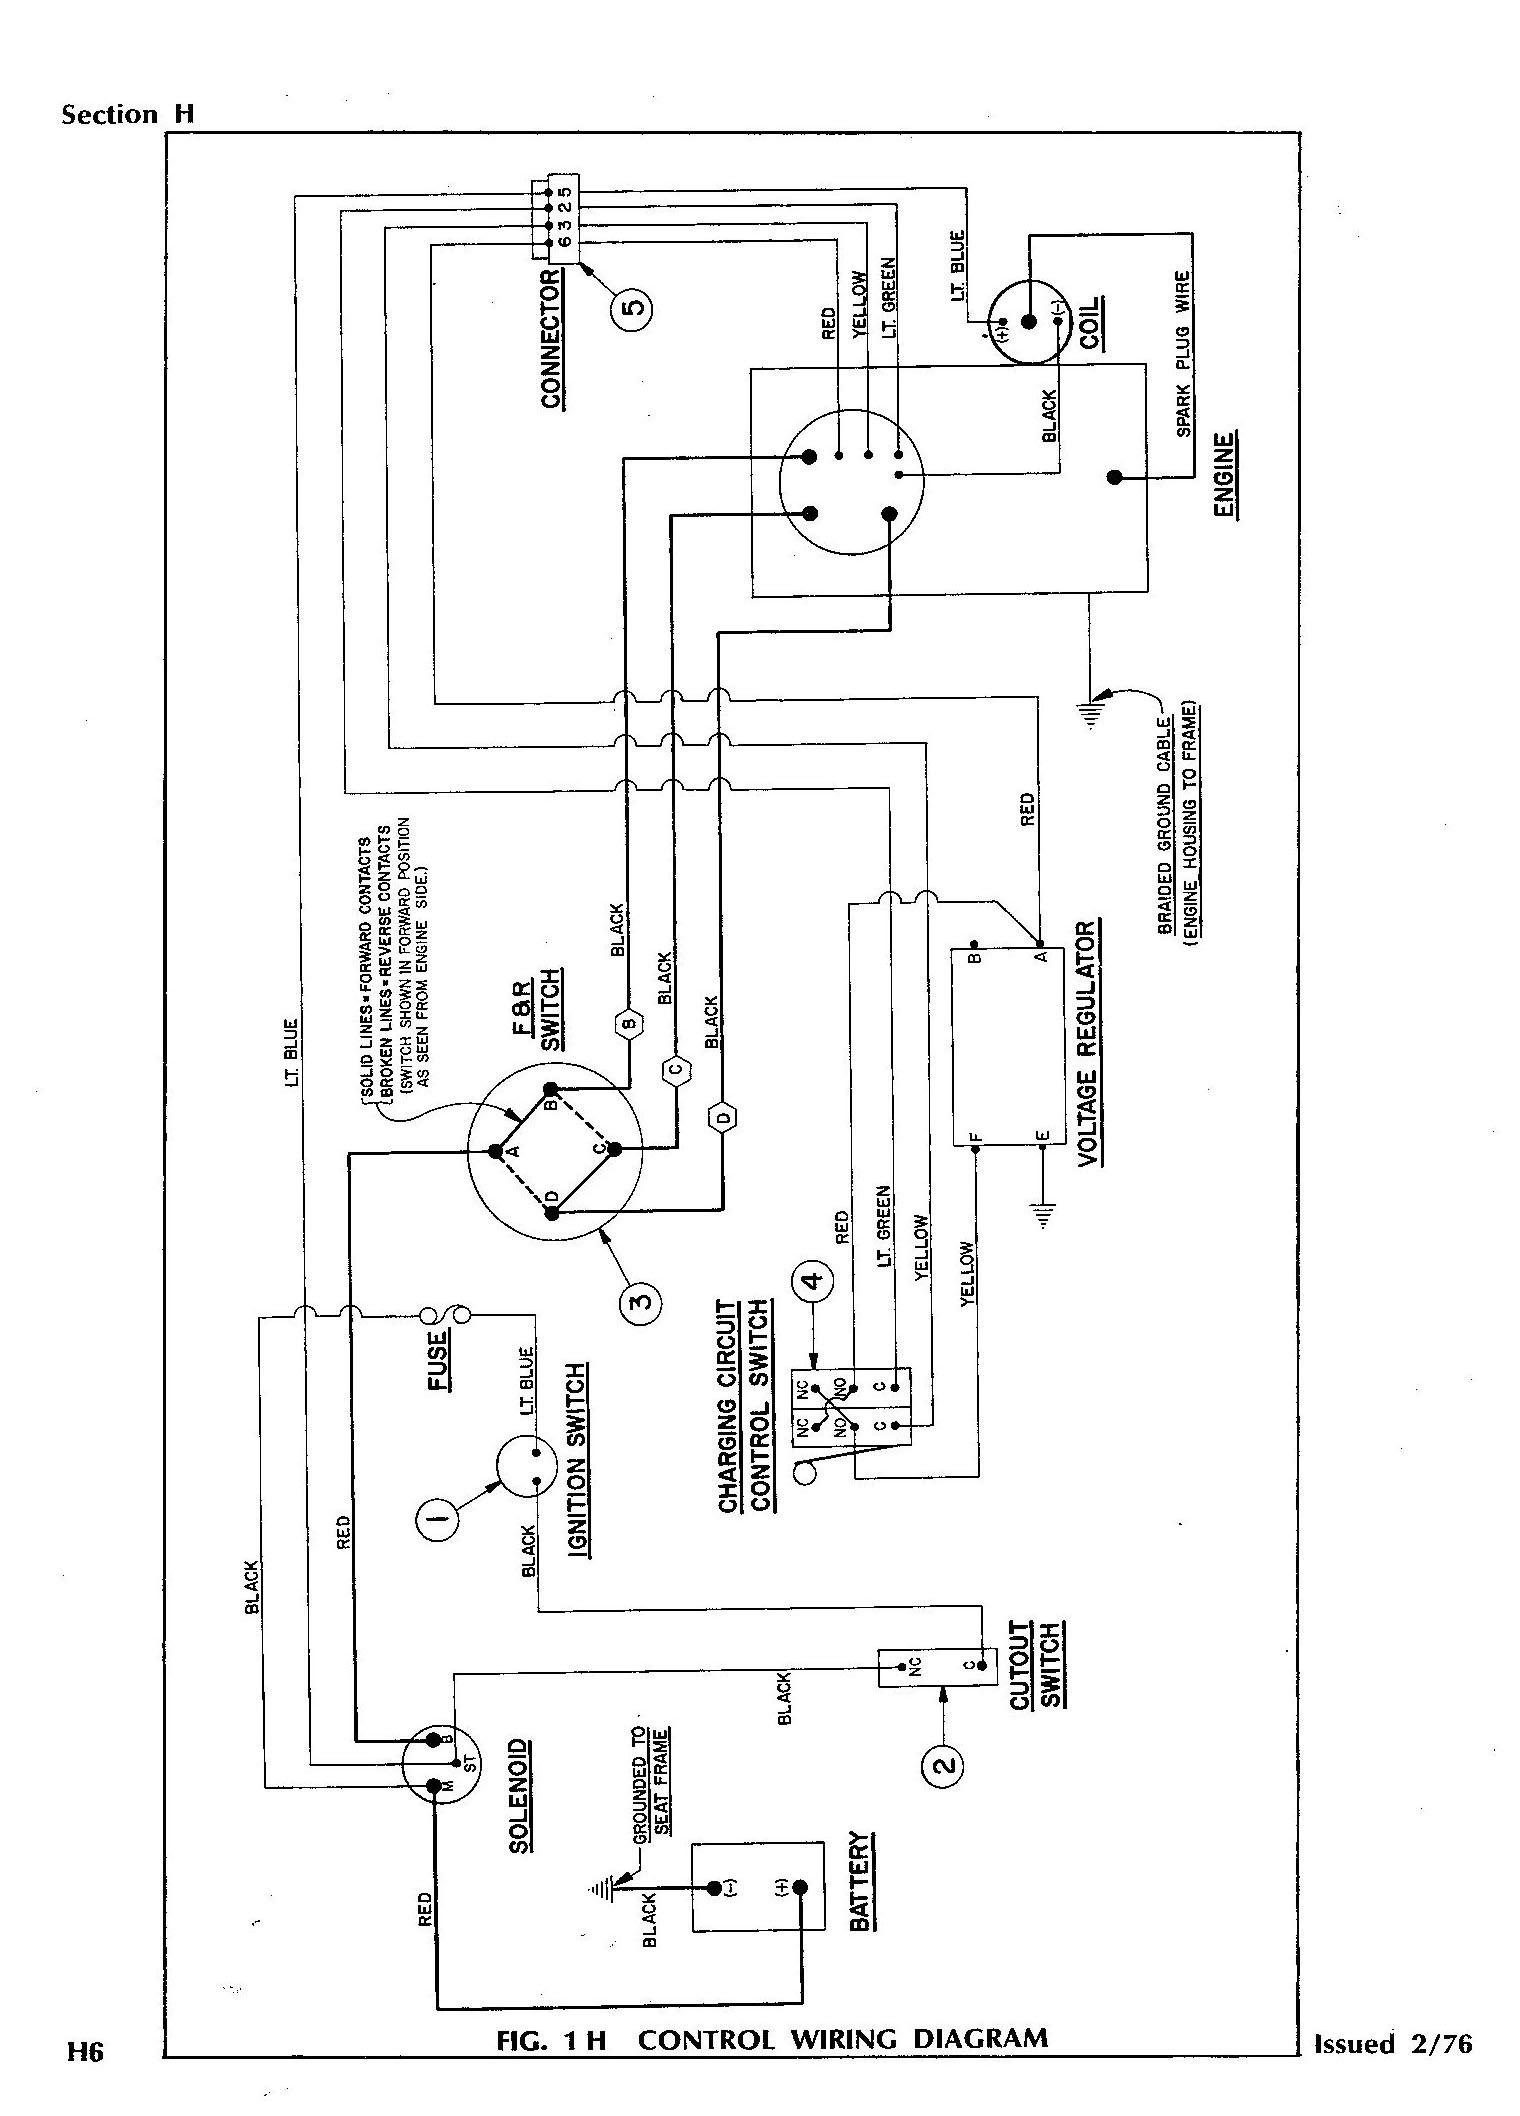 Ez Go Solenoid Wiring Diagram Magneto Seniorsclub It Electron Gossip Electron Gossip Pietrodavico It